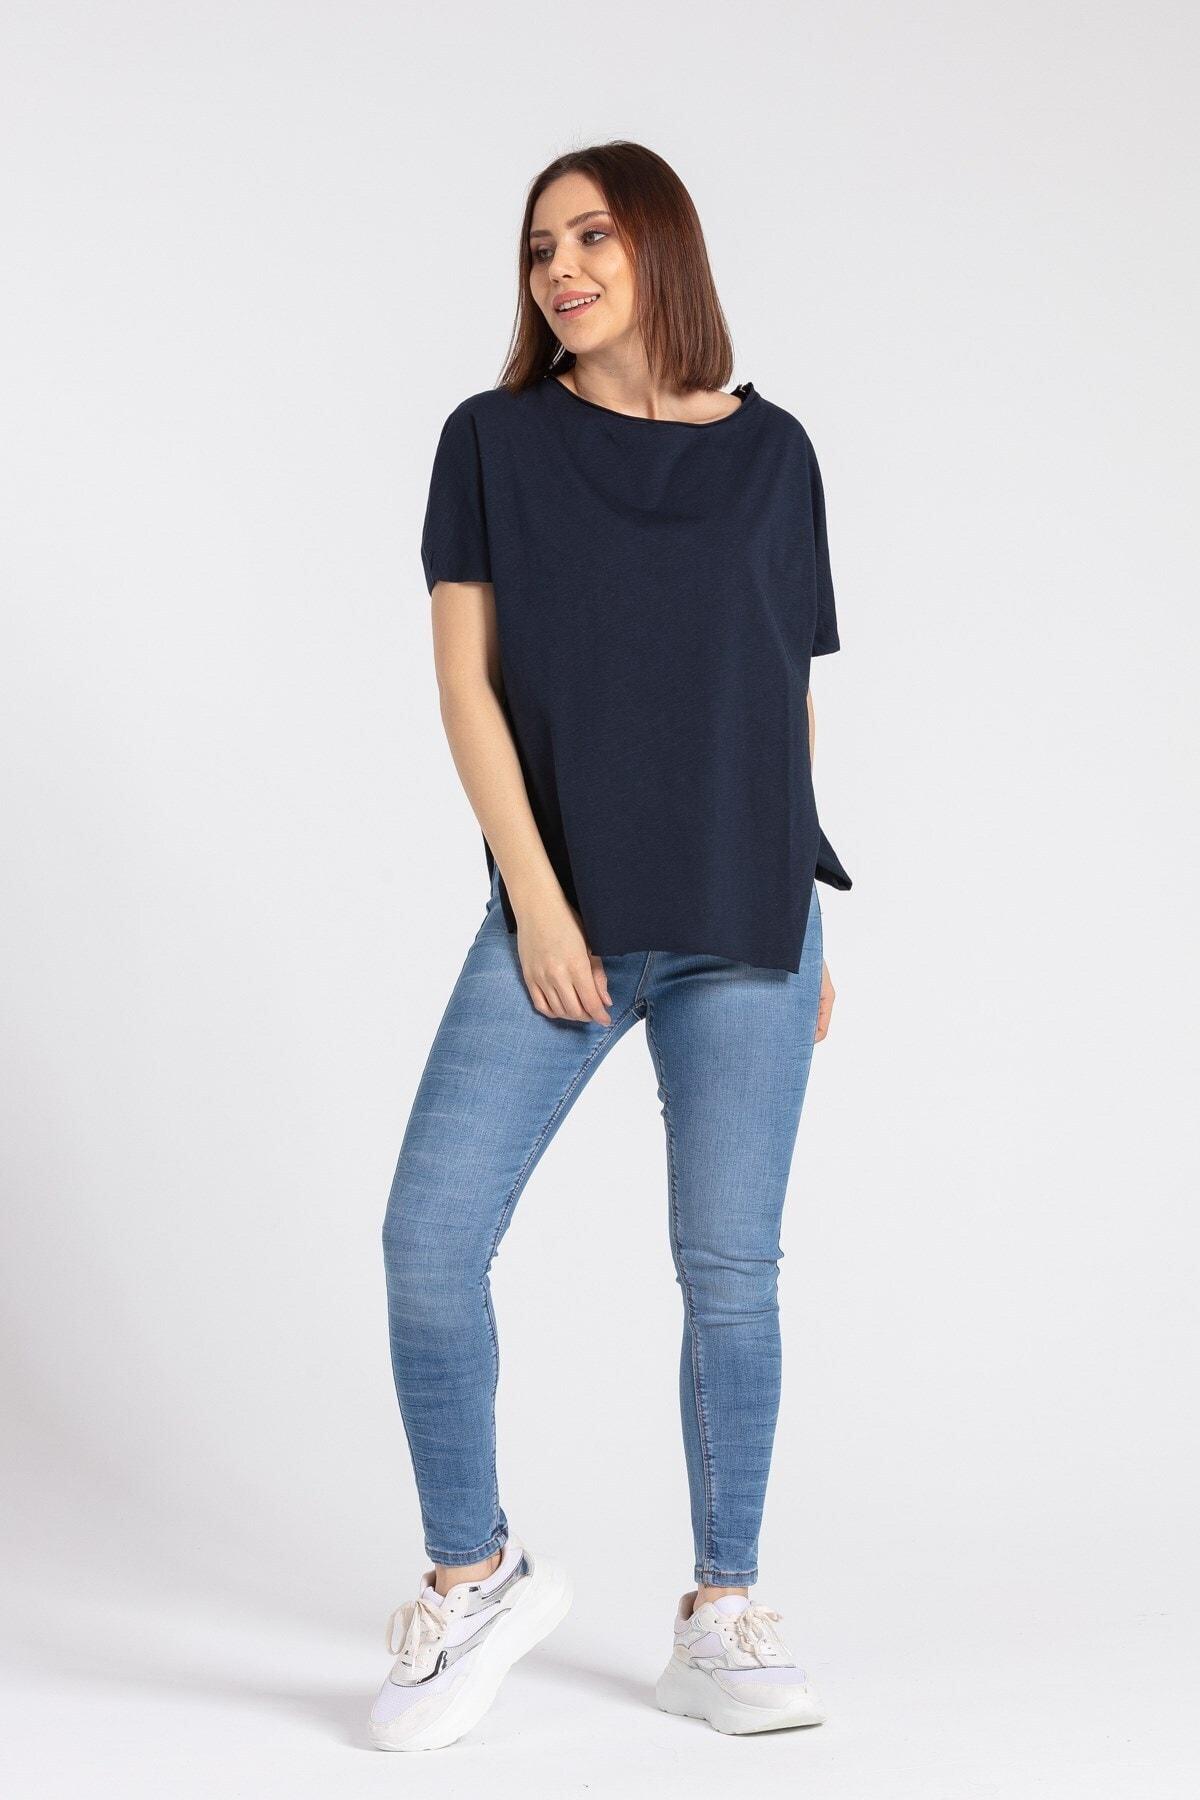 Jument Kadın Omuz Fermuarlı Salaş Pamuklu Basic Tshirt-lacivert 2